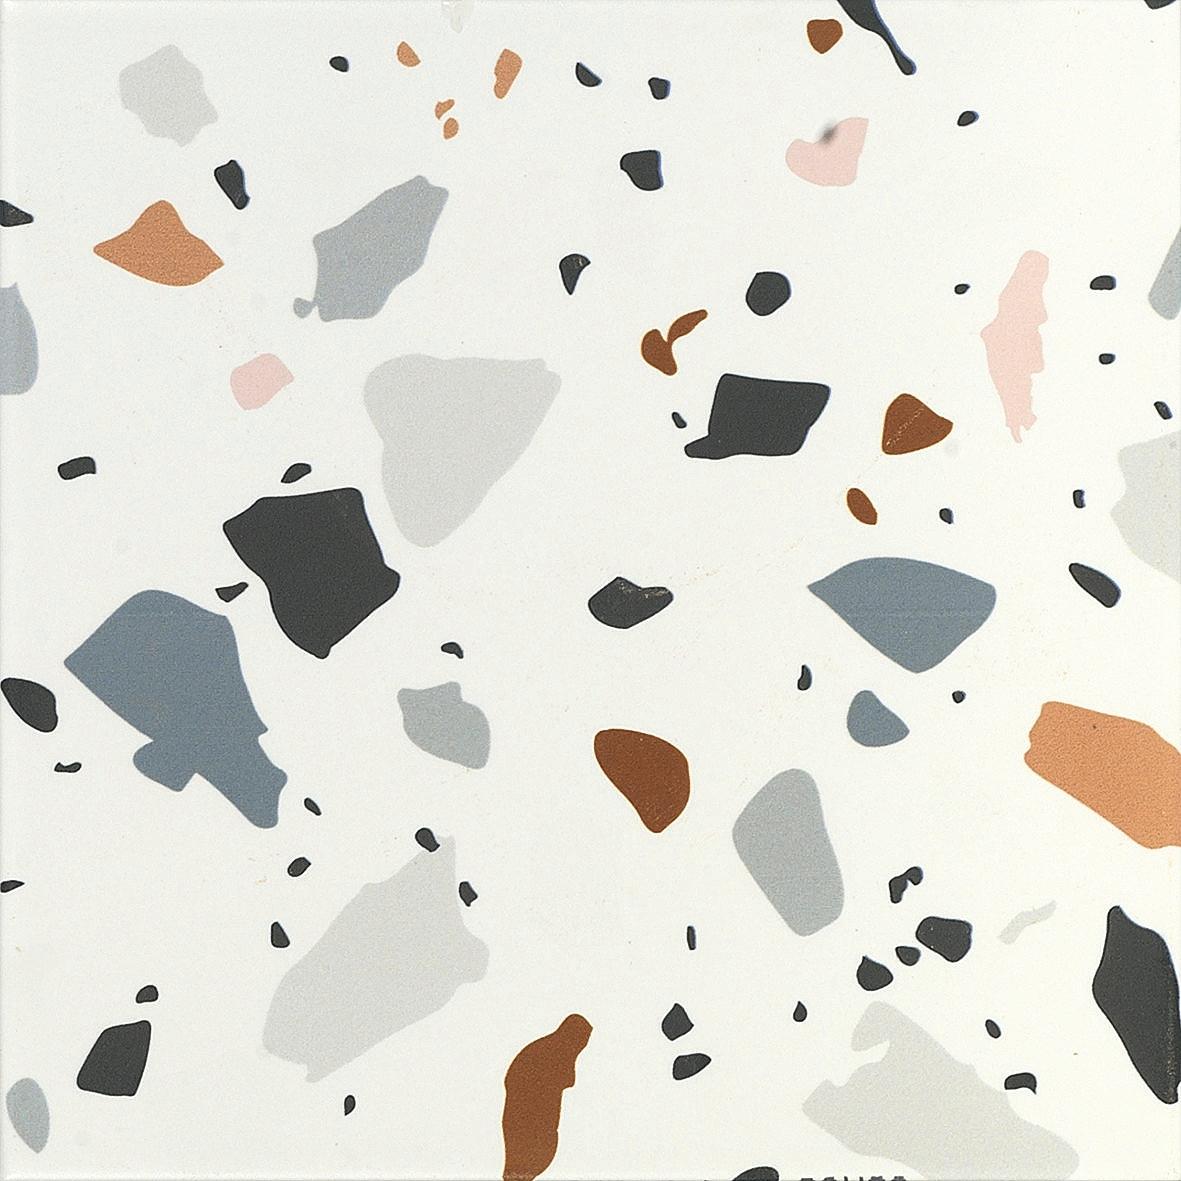 Background tile Trendy by Ape, Glazed porcelain stoneware, 20x20 cm, Surface Finish matte, Effect stone,terrazzo, Color multicolor,